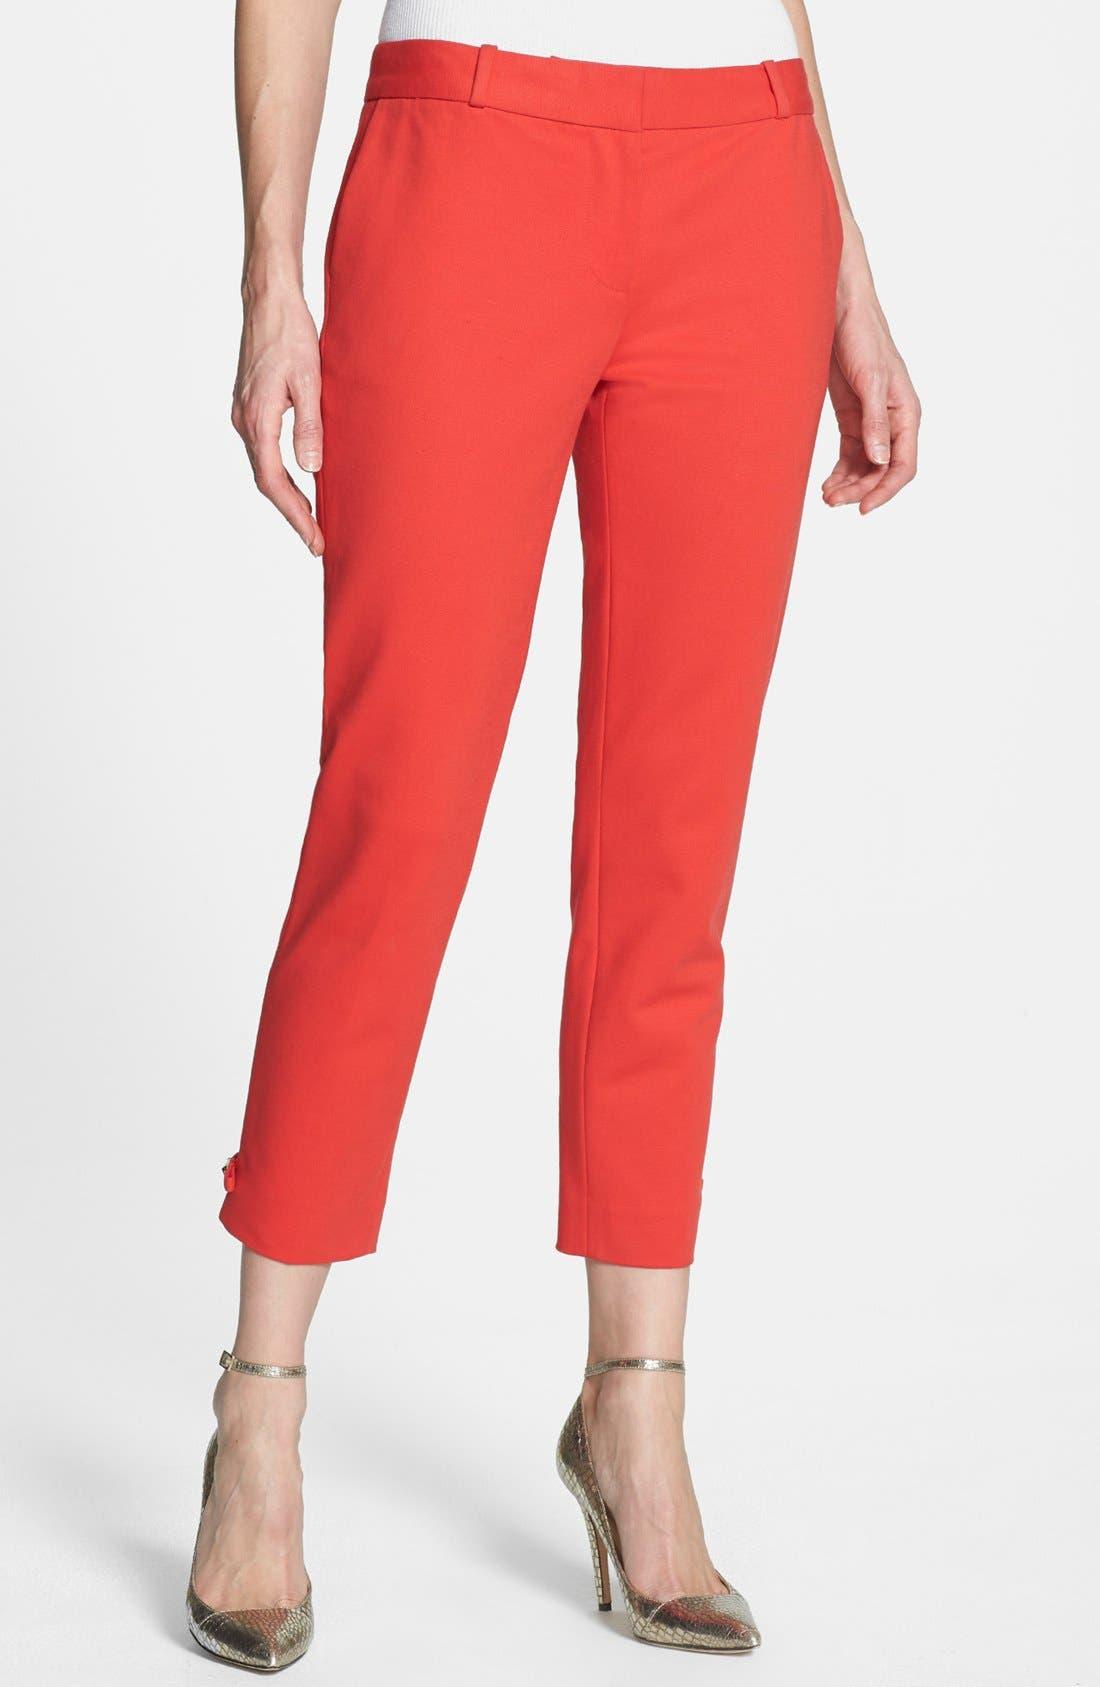 Main Image - kate spade new york 'jackie' stretch cotton capri pants